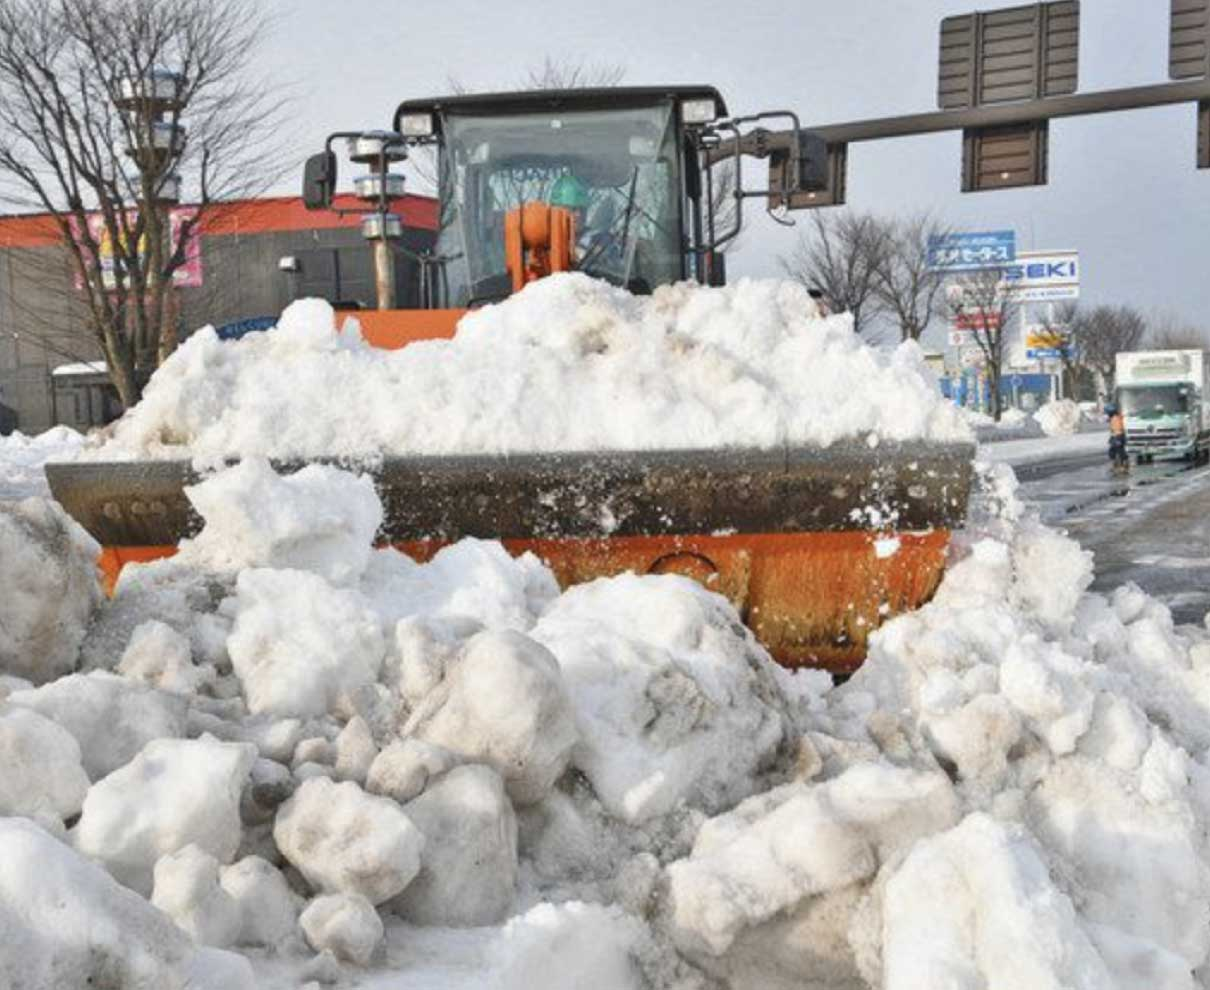 国道8号拡幅完了へ 除雪進む県内